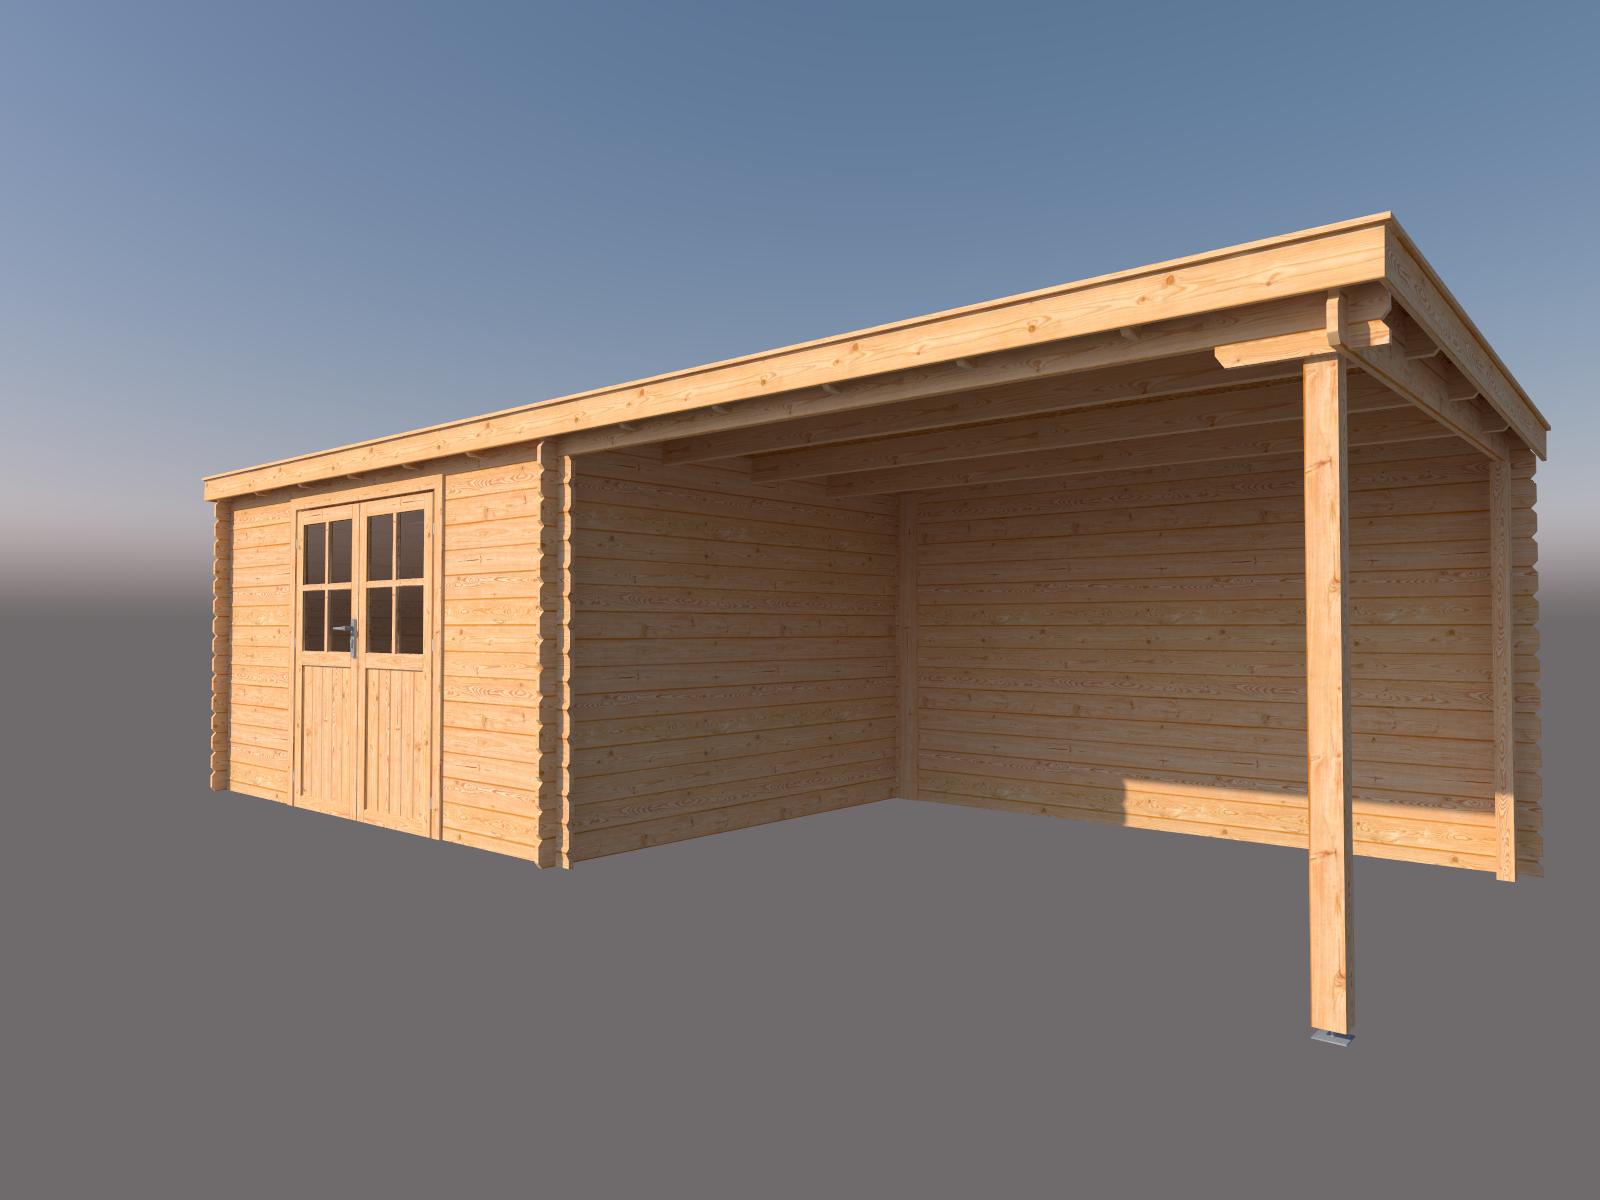 DWF Blokhut met overkapping lessenaar dak 400 x 300 + 350cm